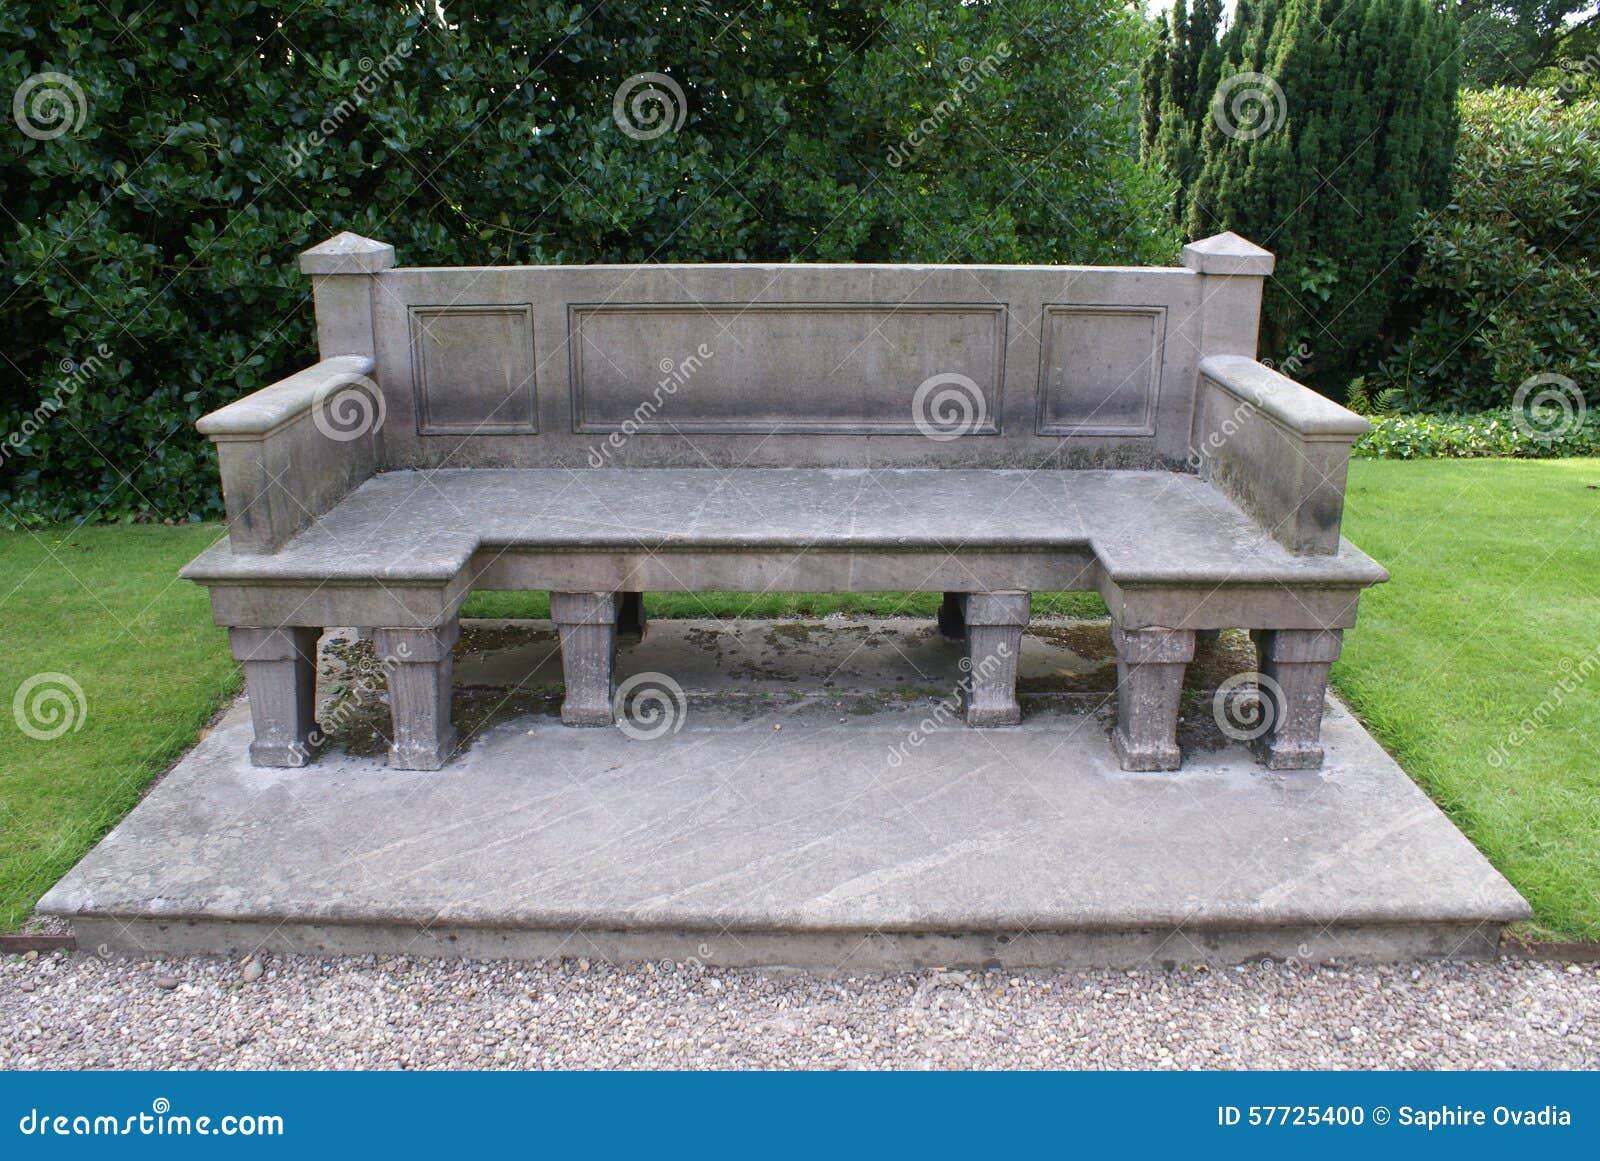 Wondrous Stone Seat Stone Bench Stock Photo Image Of Interest Bralicious Painted Fabric Chair Ideas Braliciousco